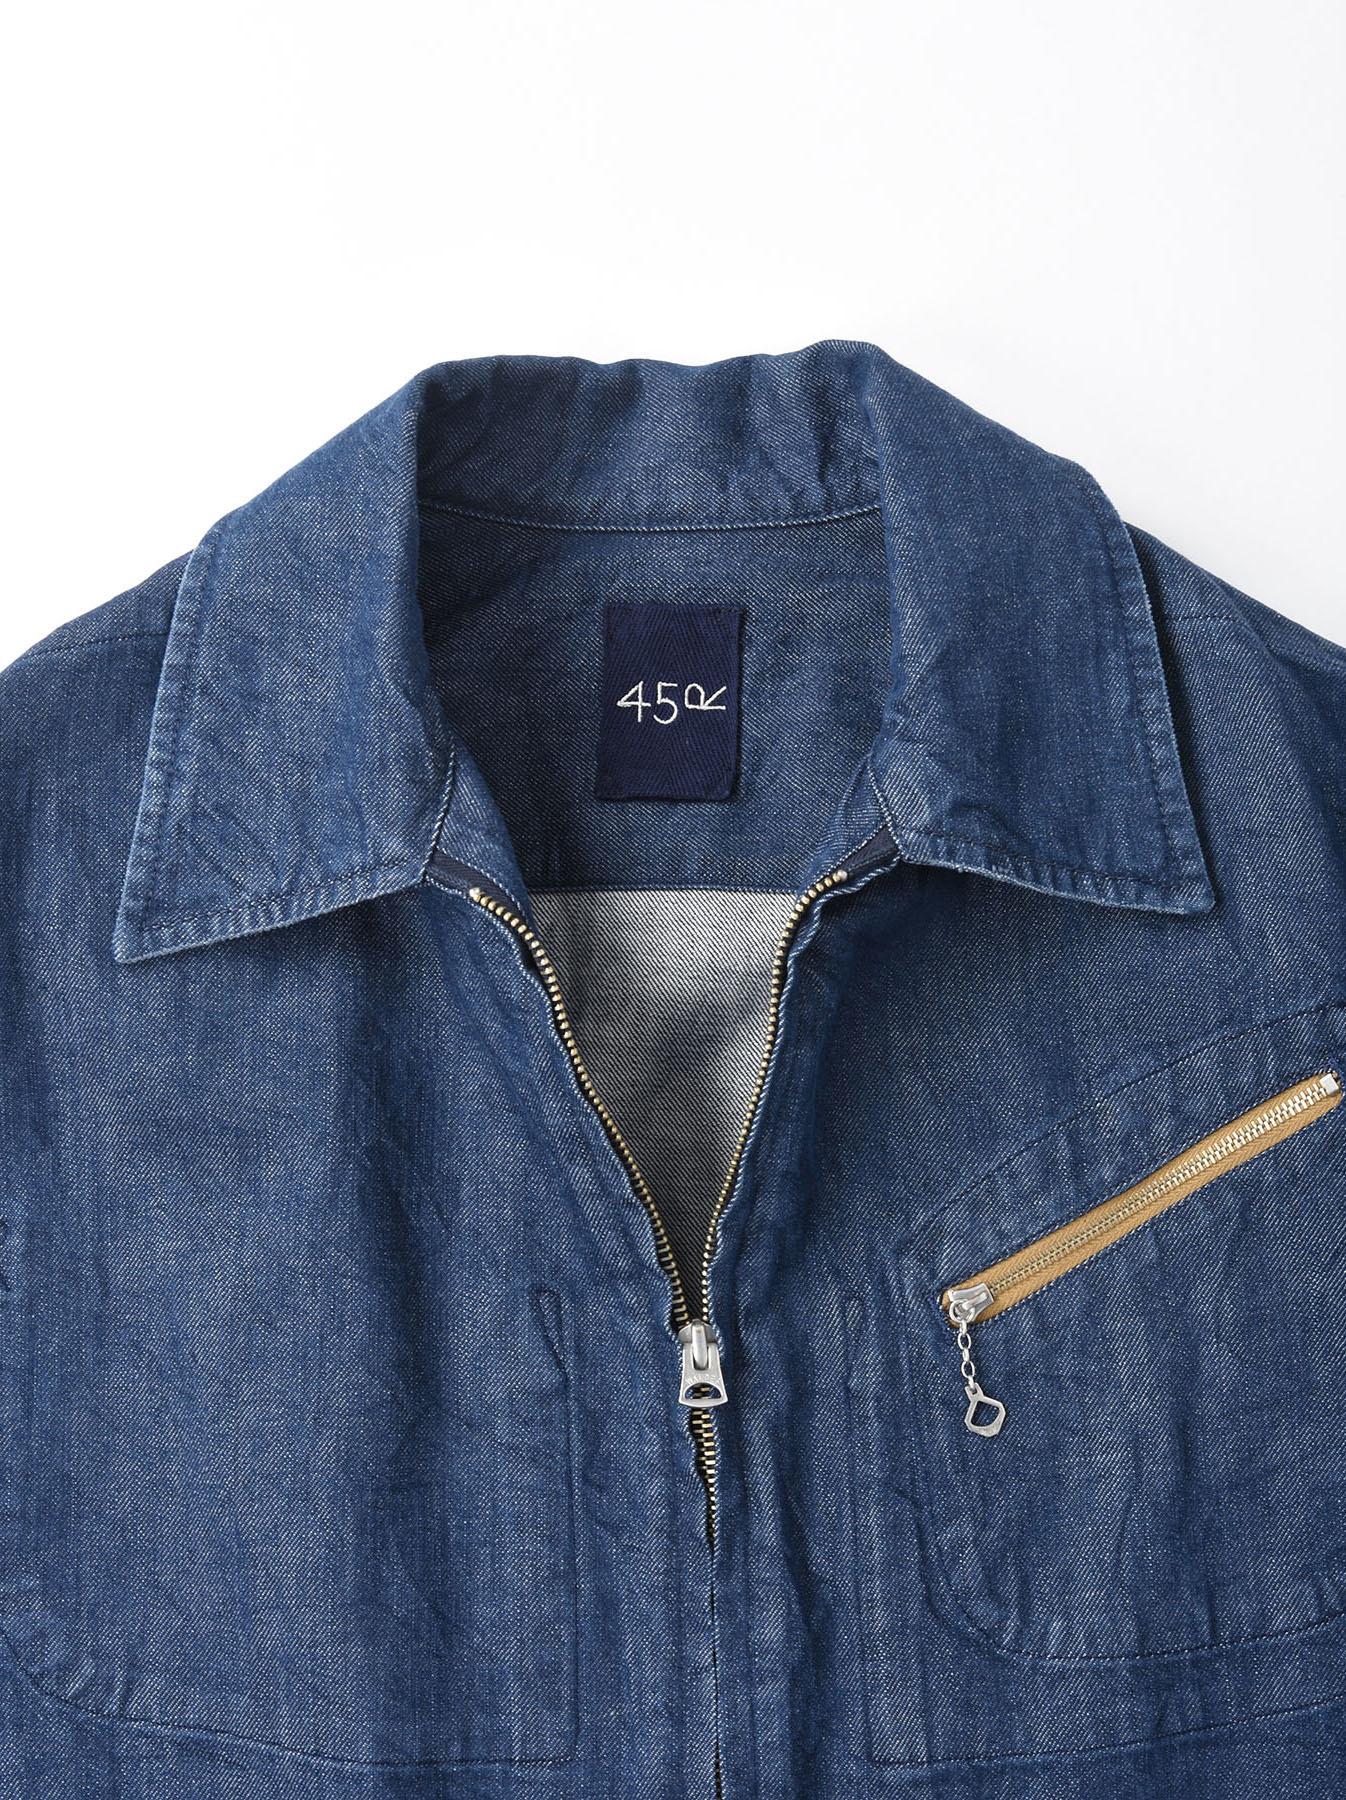 Distressed Mugi Denim Jacket-5